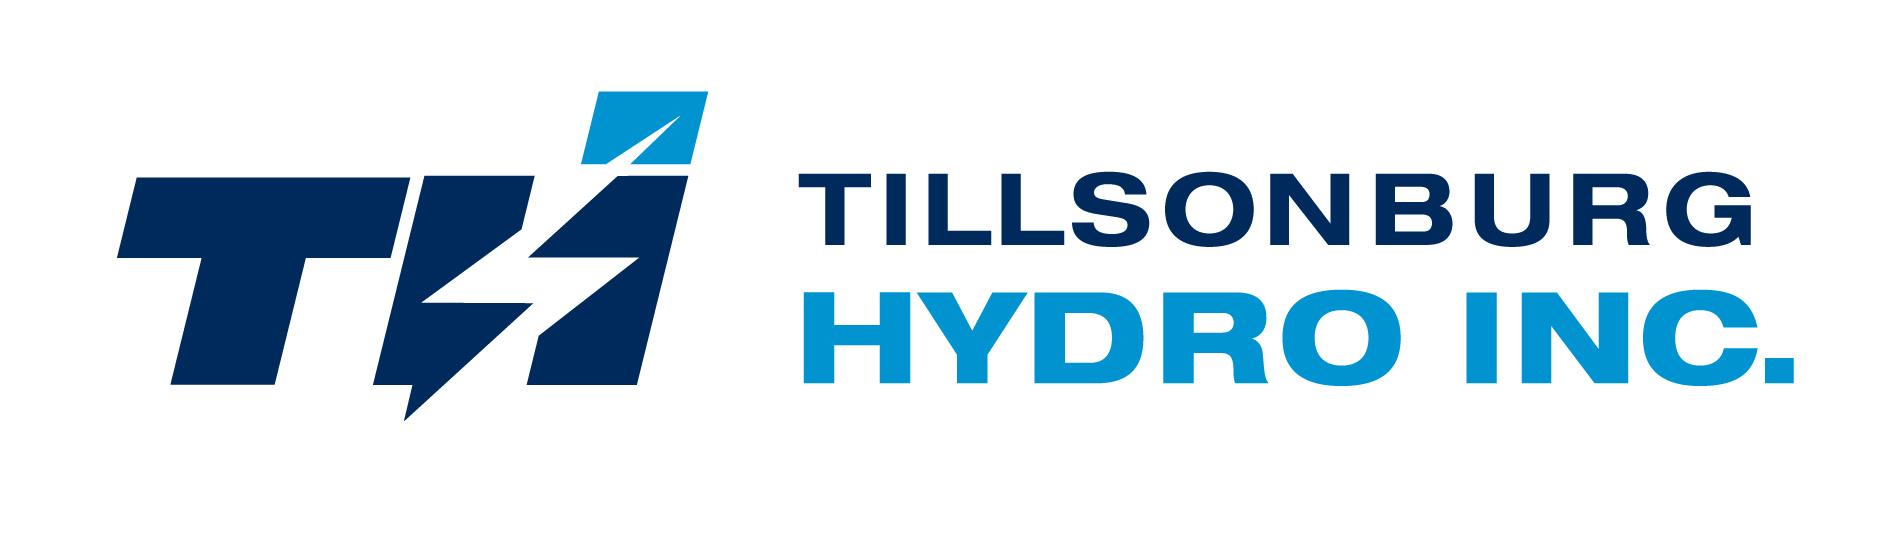 Tillsonburg Hydro Inc. Logo